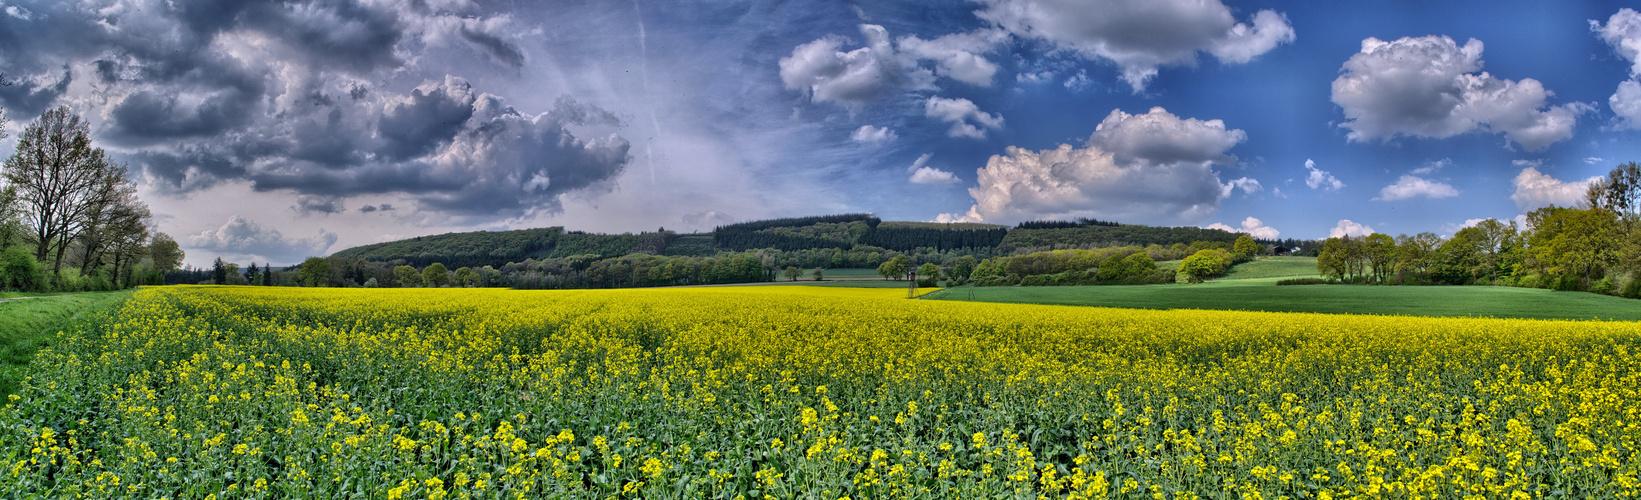 Rapsfeld bei Untermaubach